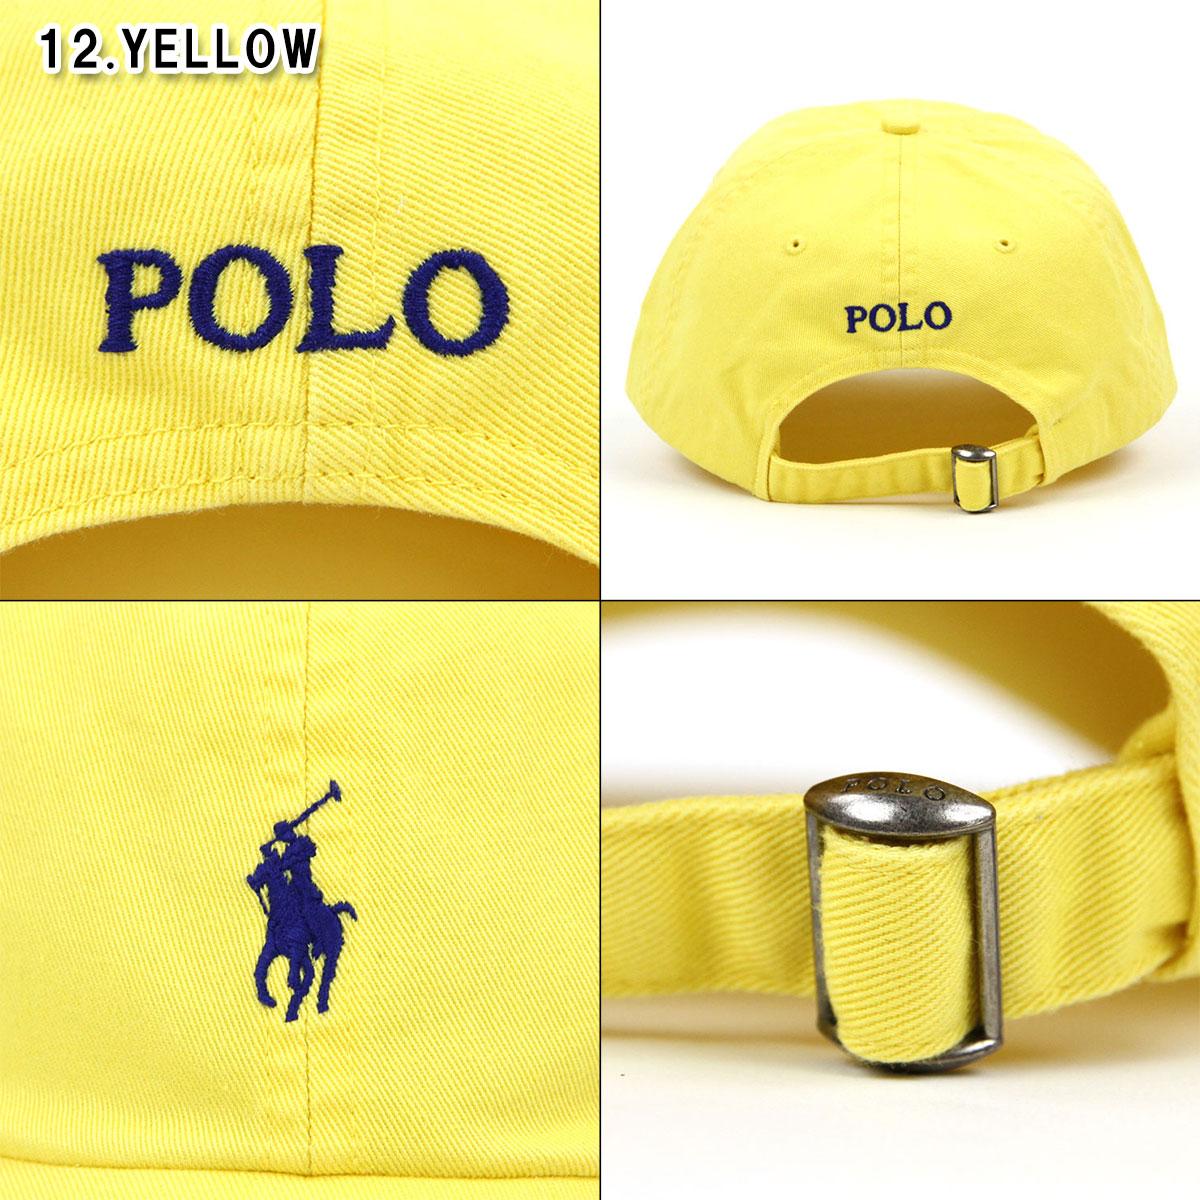 Entering polo Ralph Lauren POLO RALPH LAUREN regular article men hat cap  one point embroidery COTTON BASEBALL CAP 7110cc11d710